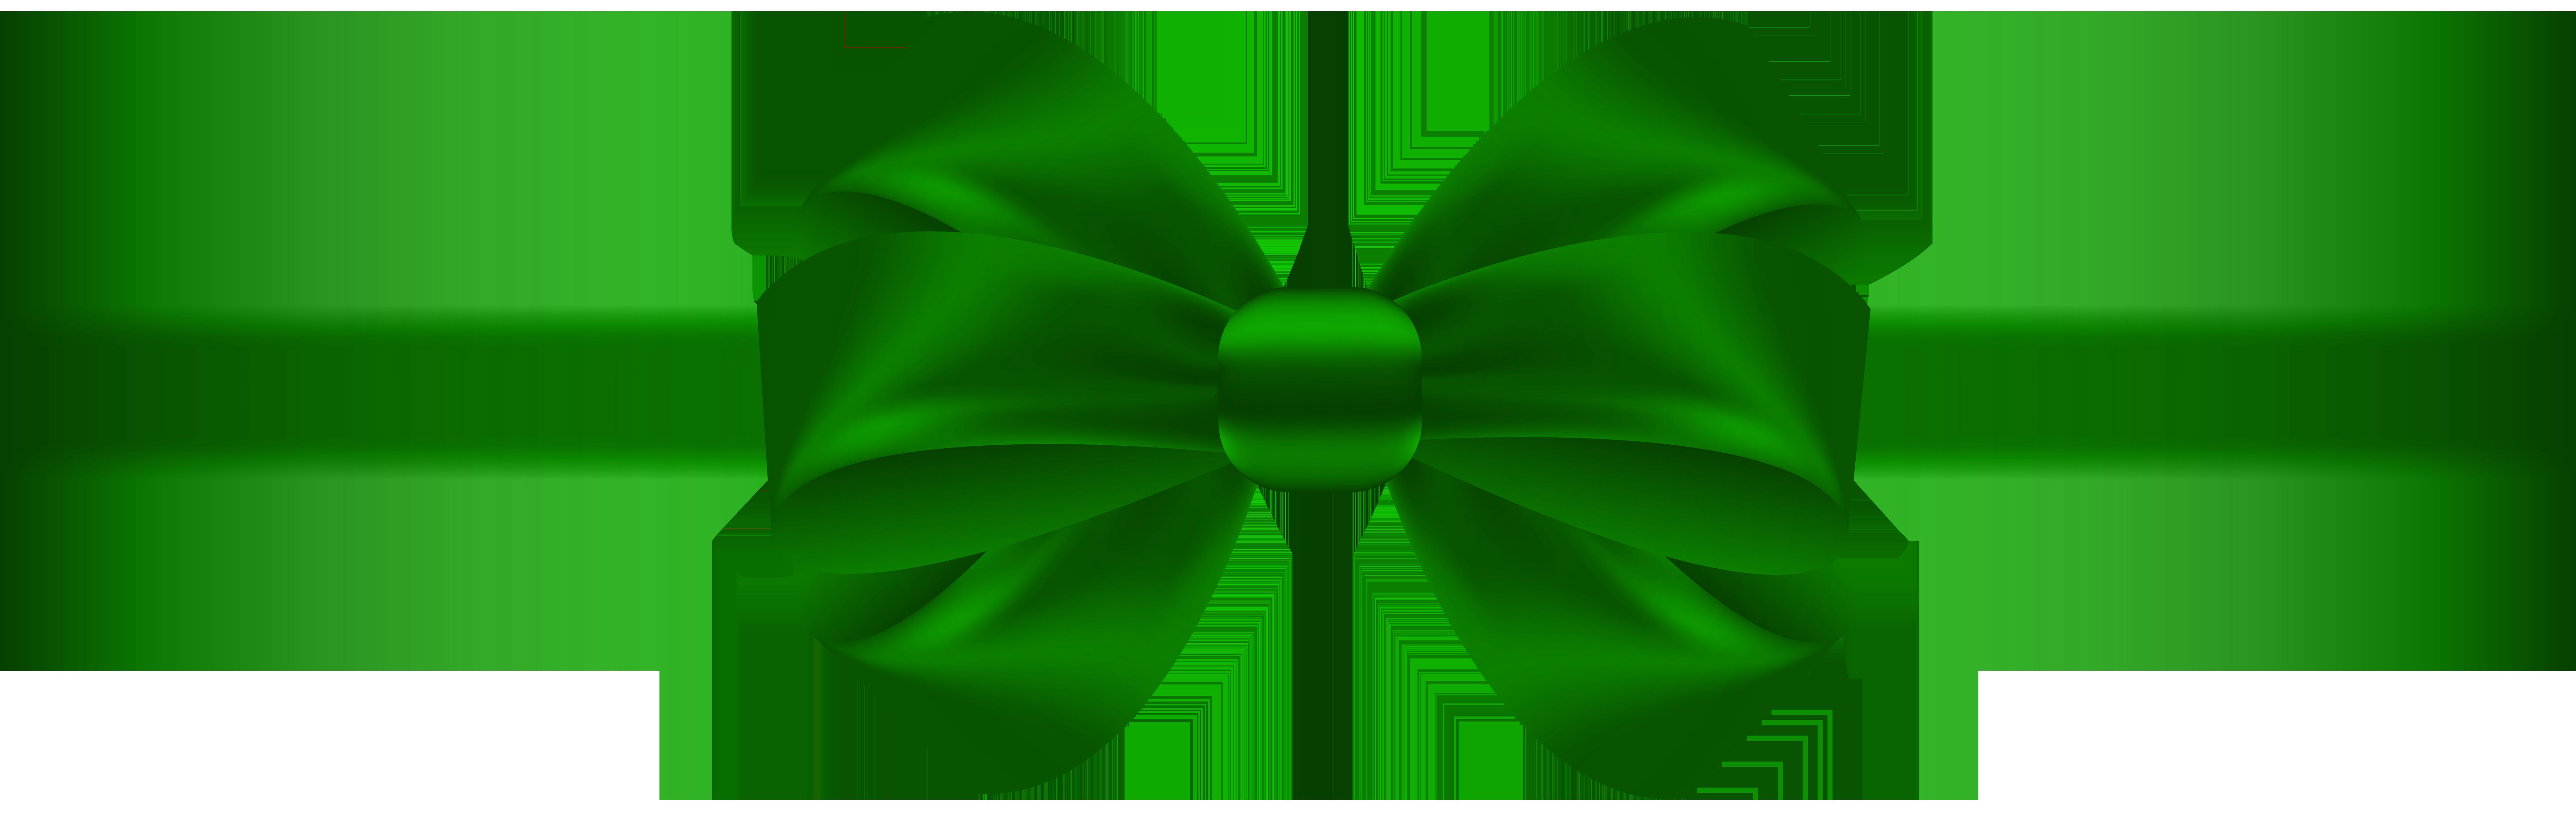 Clipart bow light green. Transparent png clip art